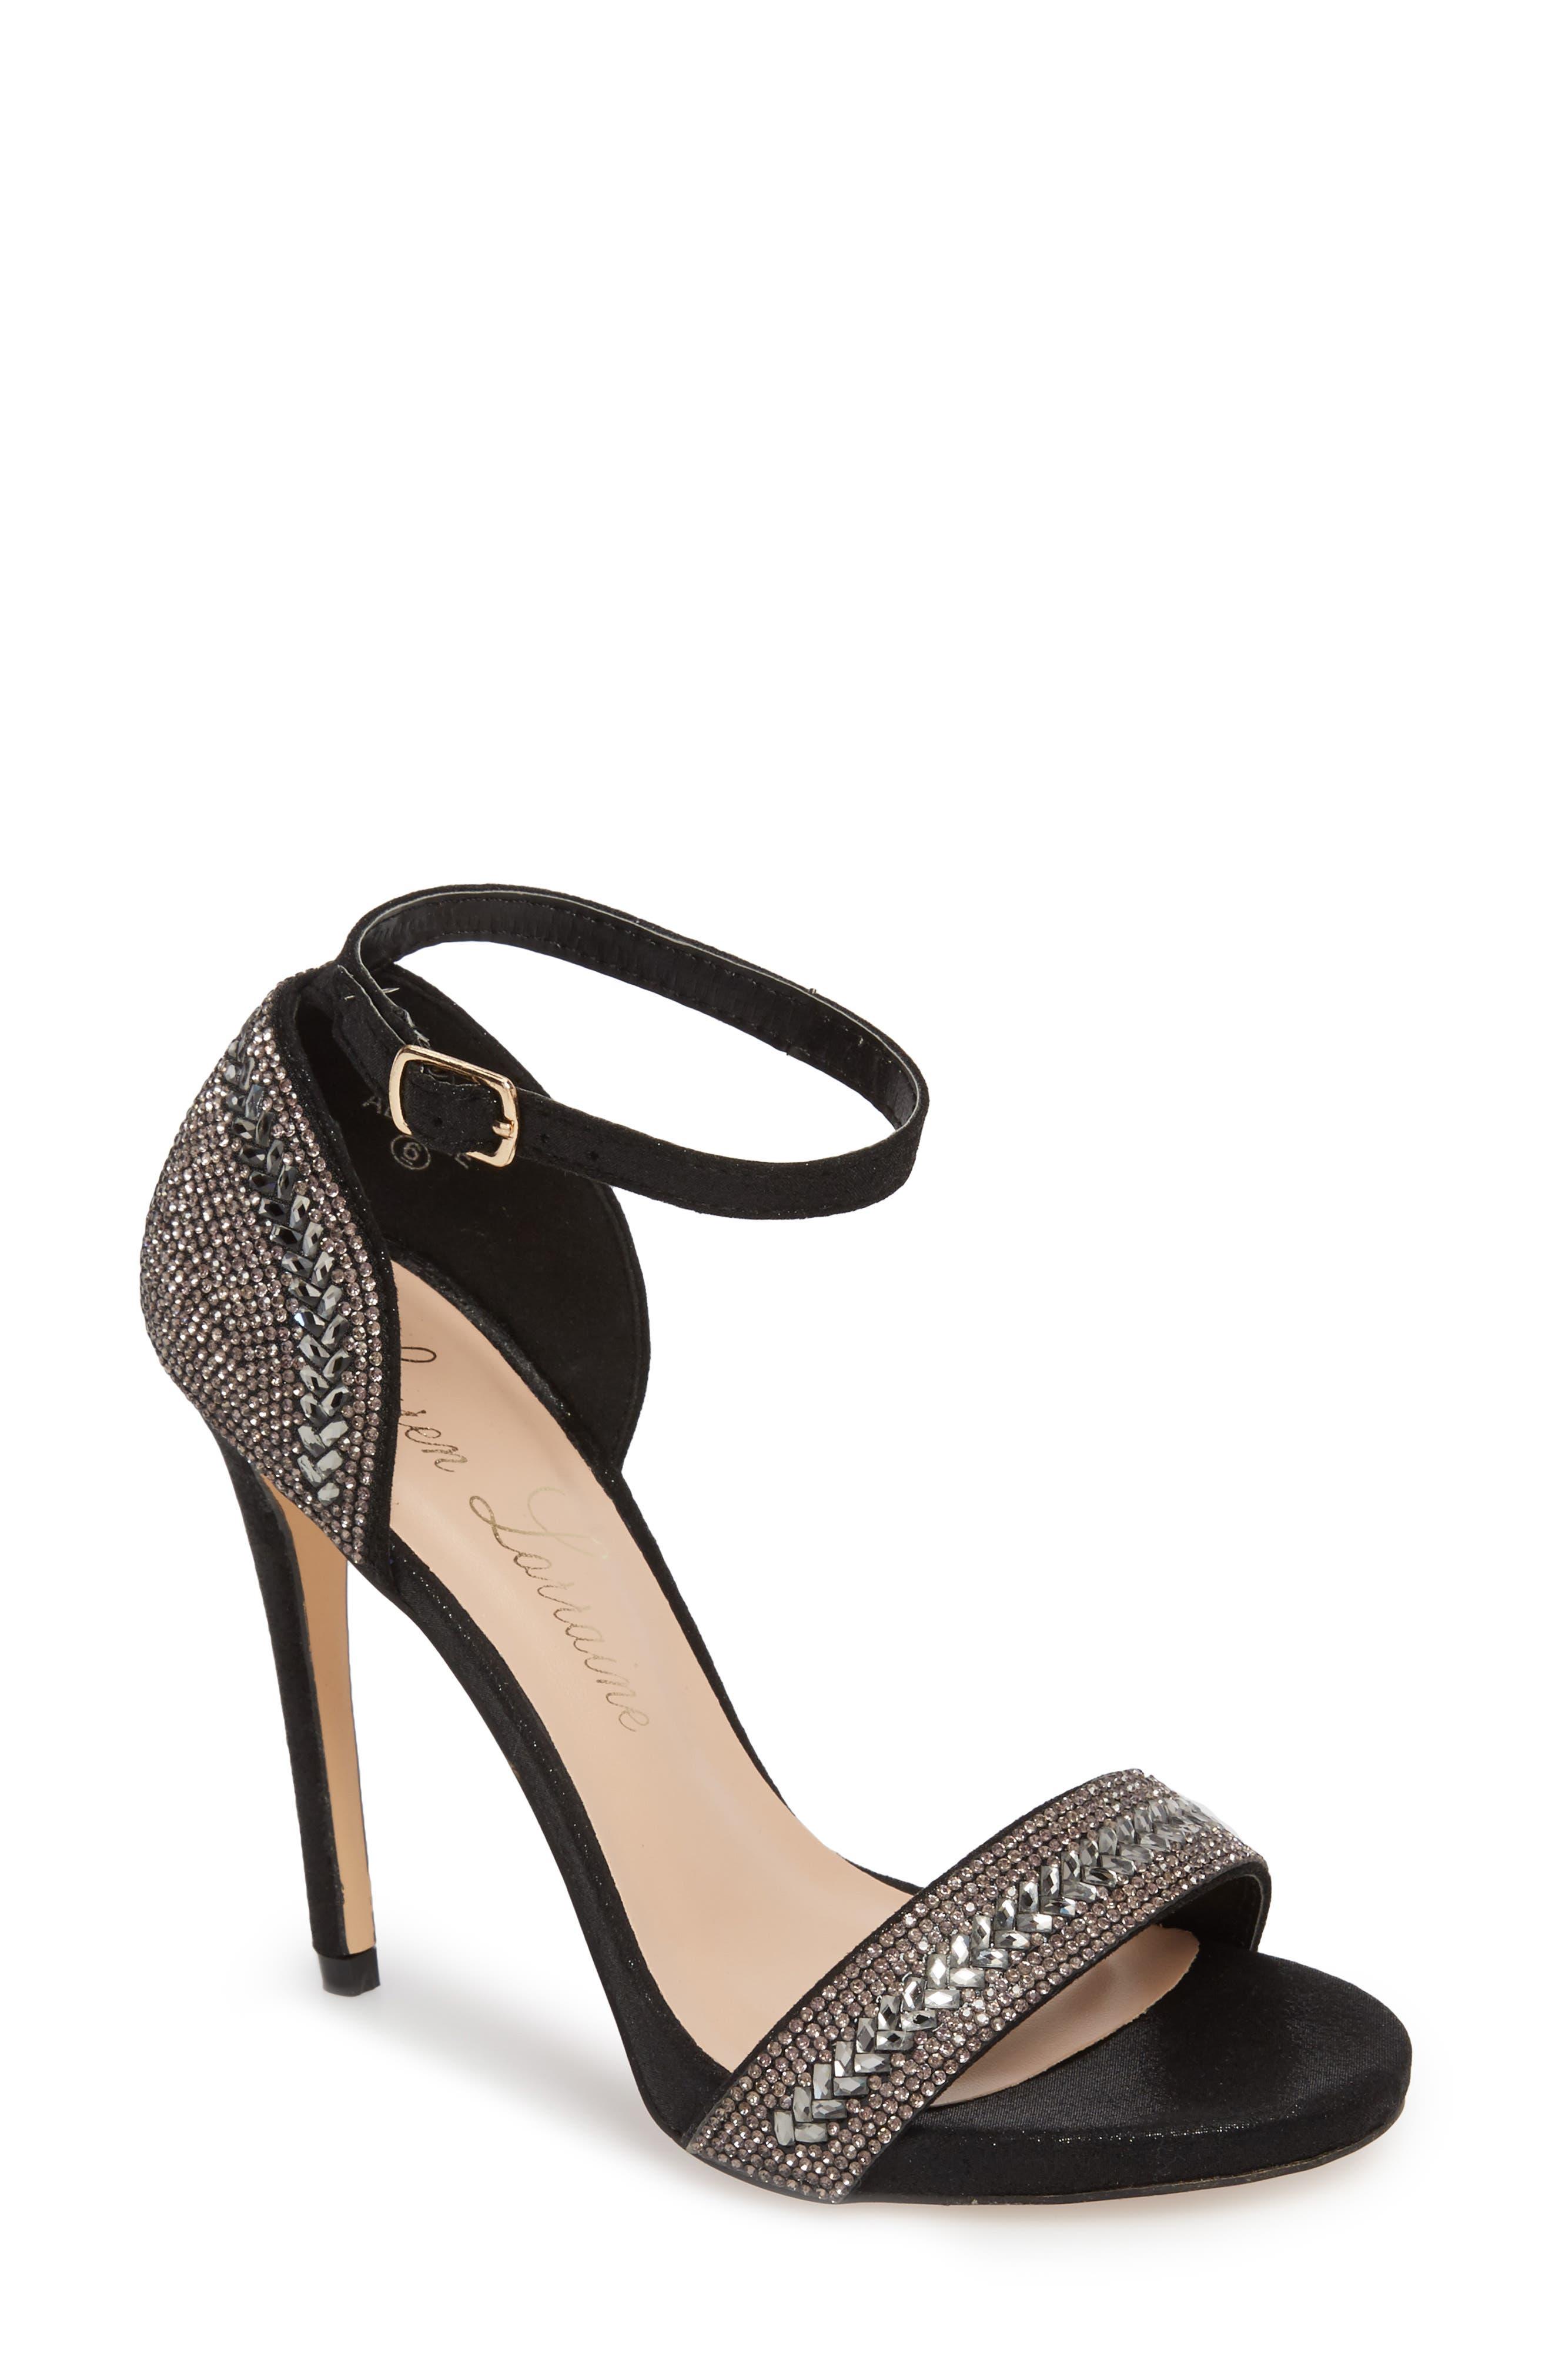 Alternate Image 1 Selected - Lauren Lorraine Adelle Embellished Sandal (Women)